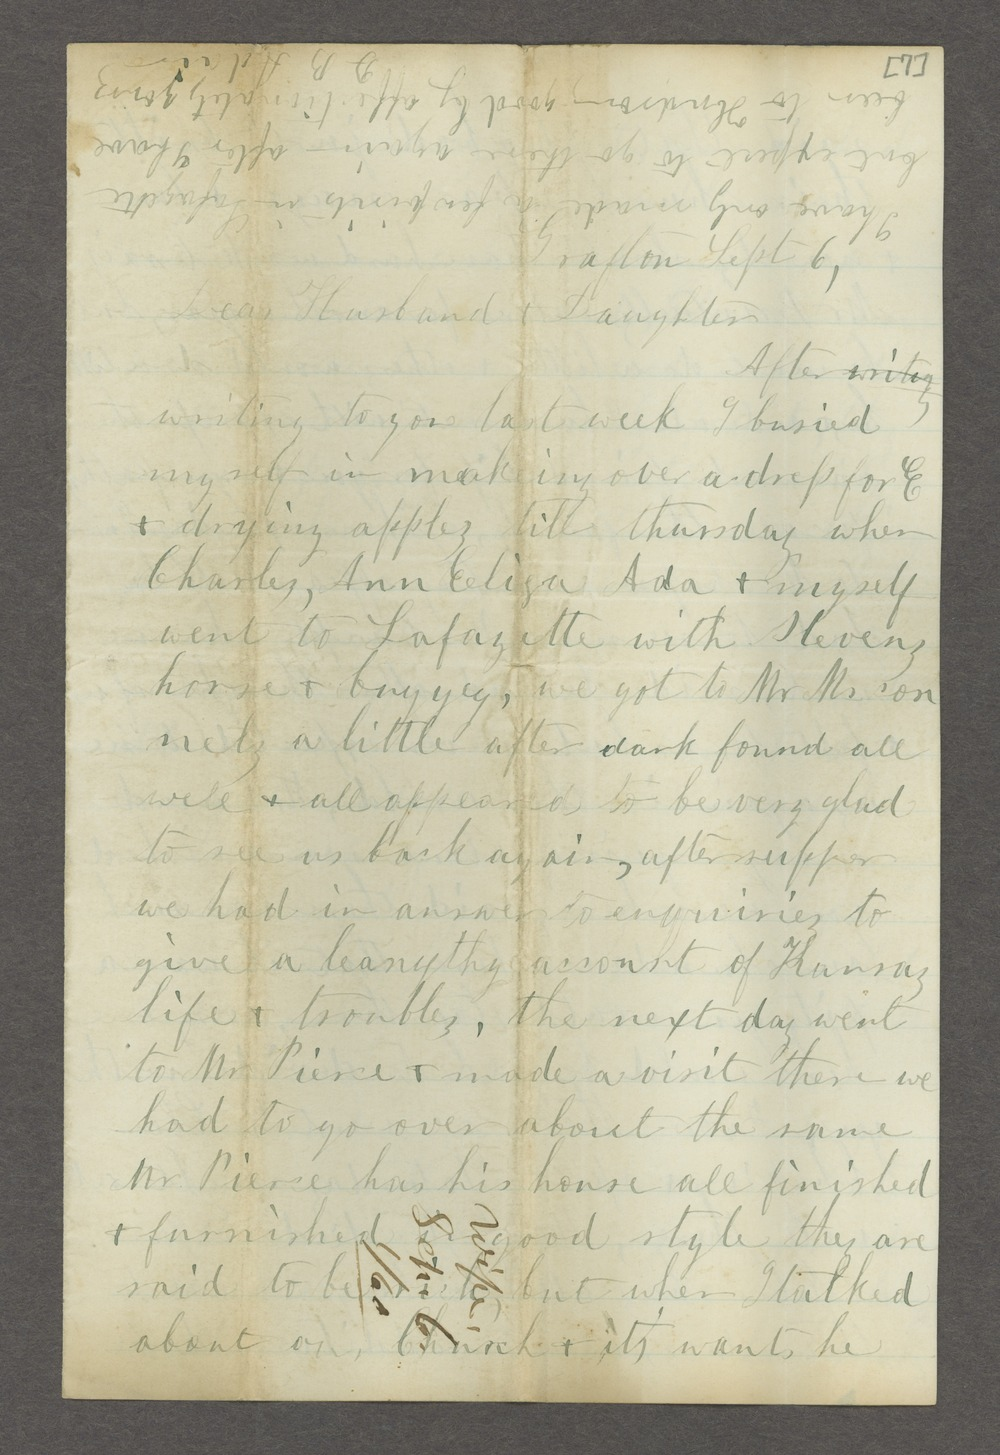 Correspondence between Samuel Lyle Adair, Florella Brown Adair, and their children - 9